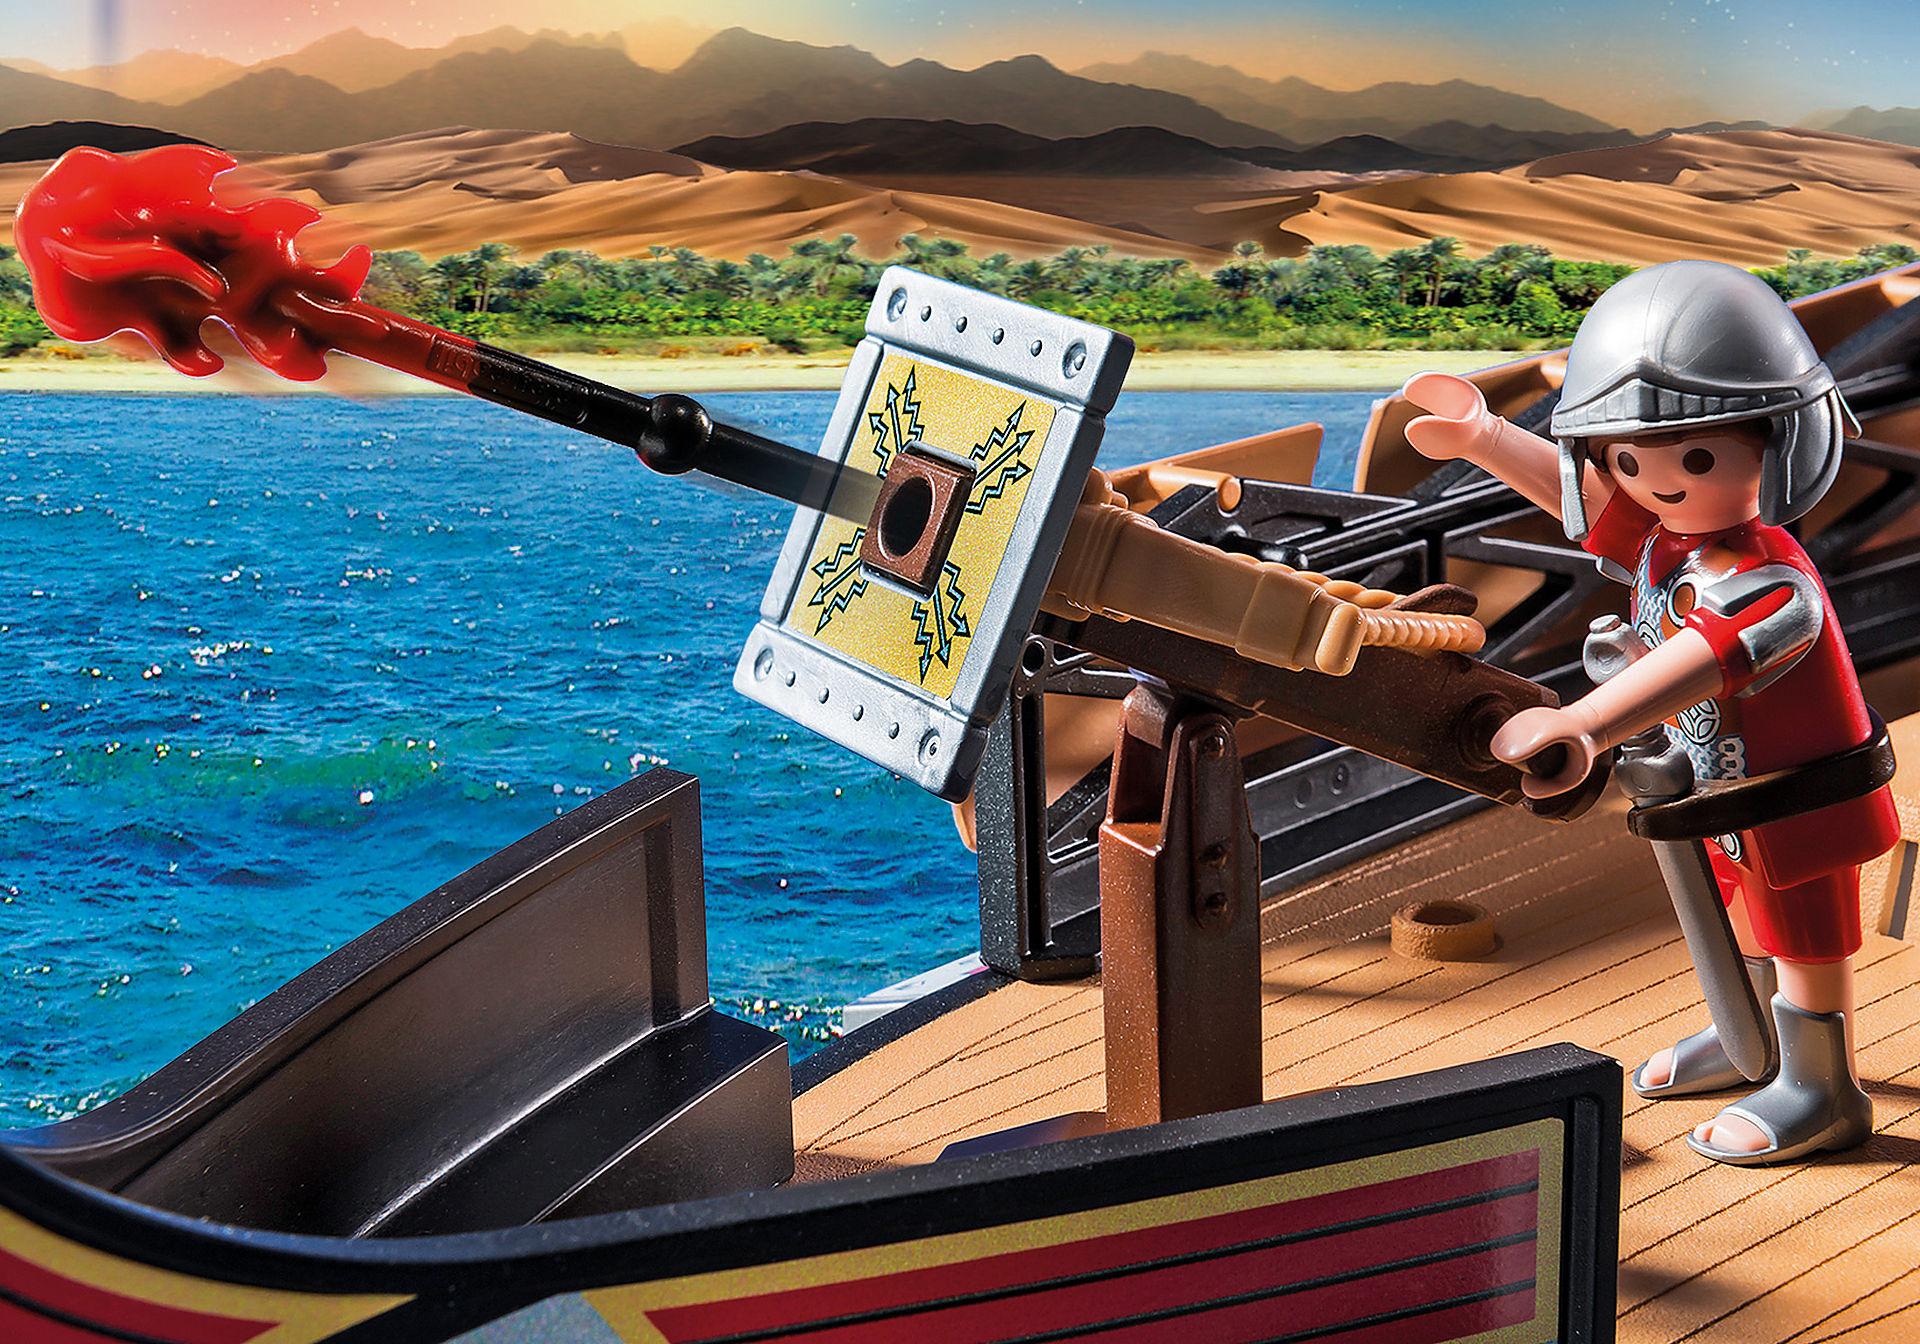 5390 Римляне и Египтяне: Корабль Римских воинов zoom image6